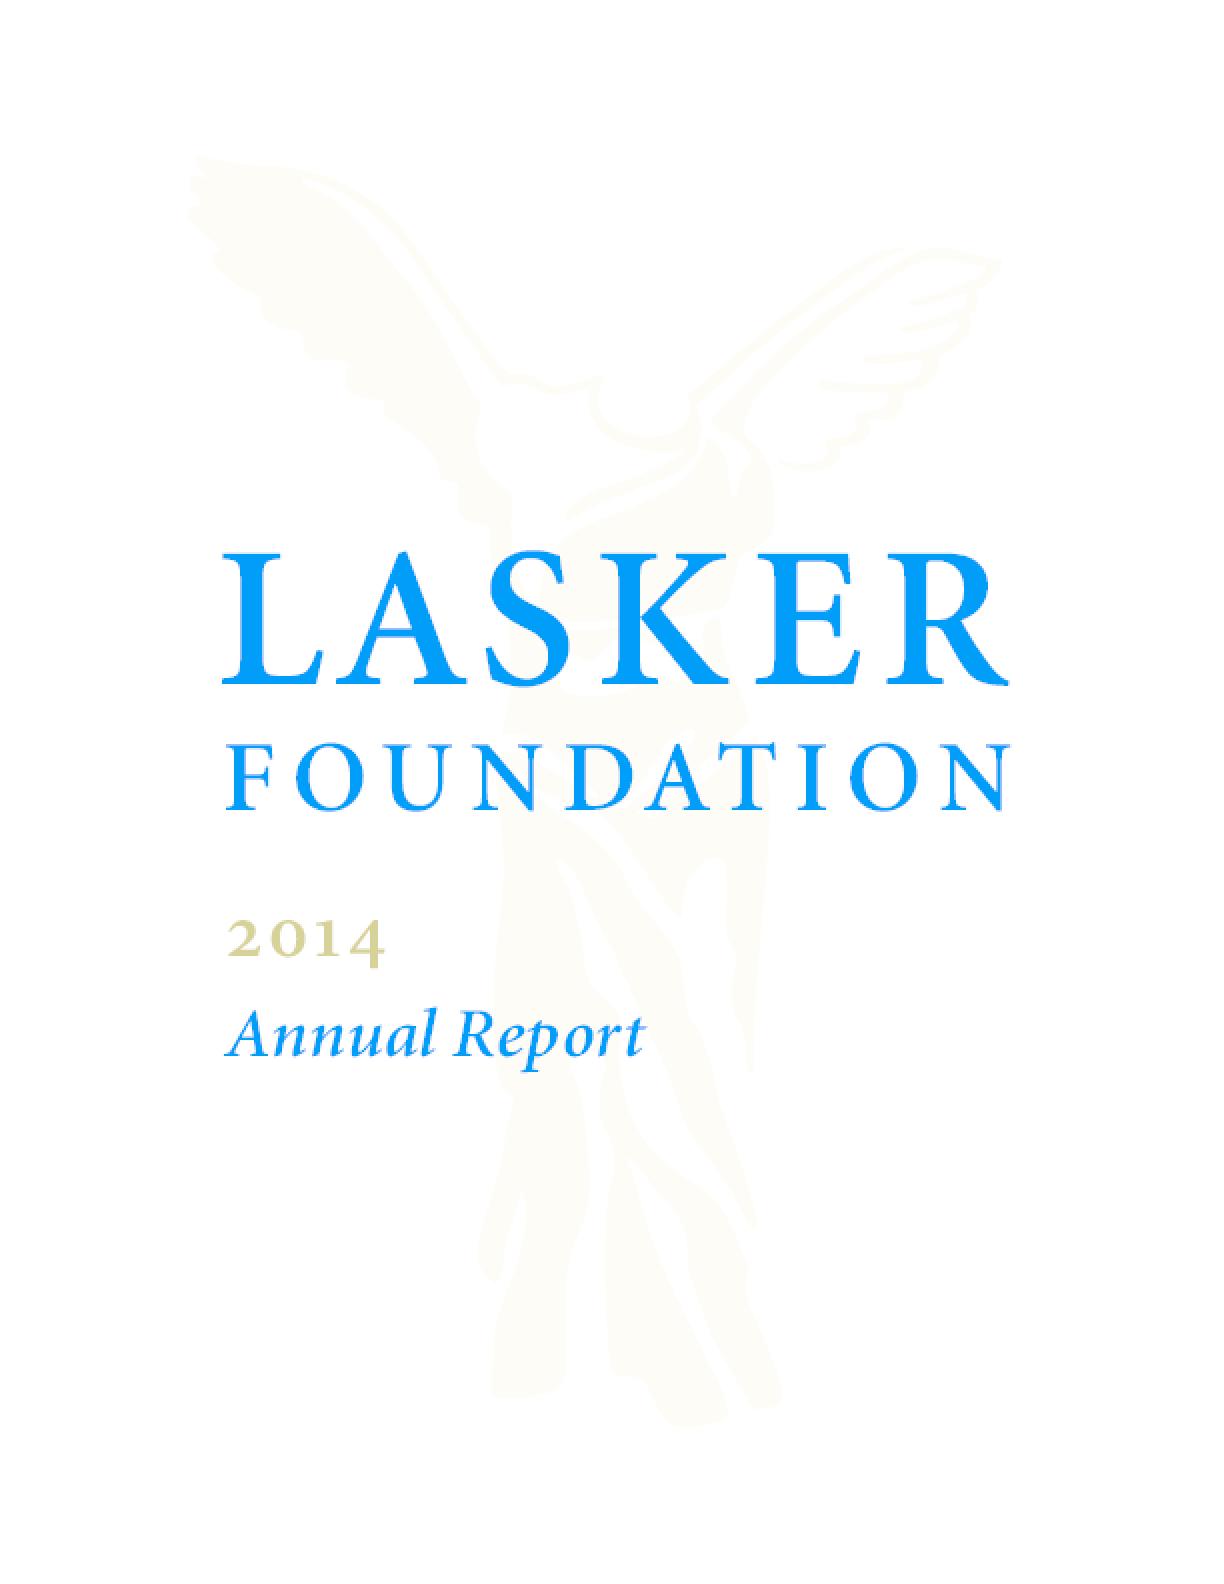 Lasker Foundation: 2014 Annual Report